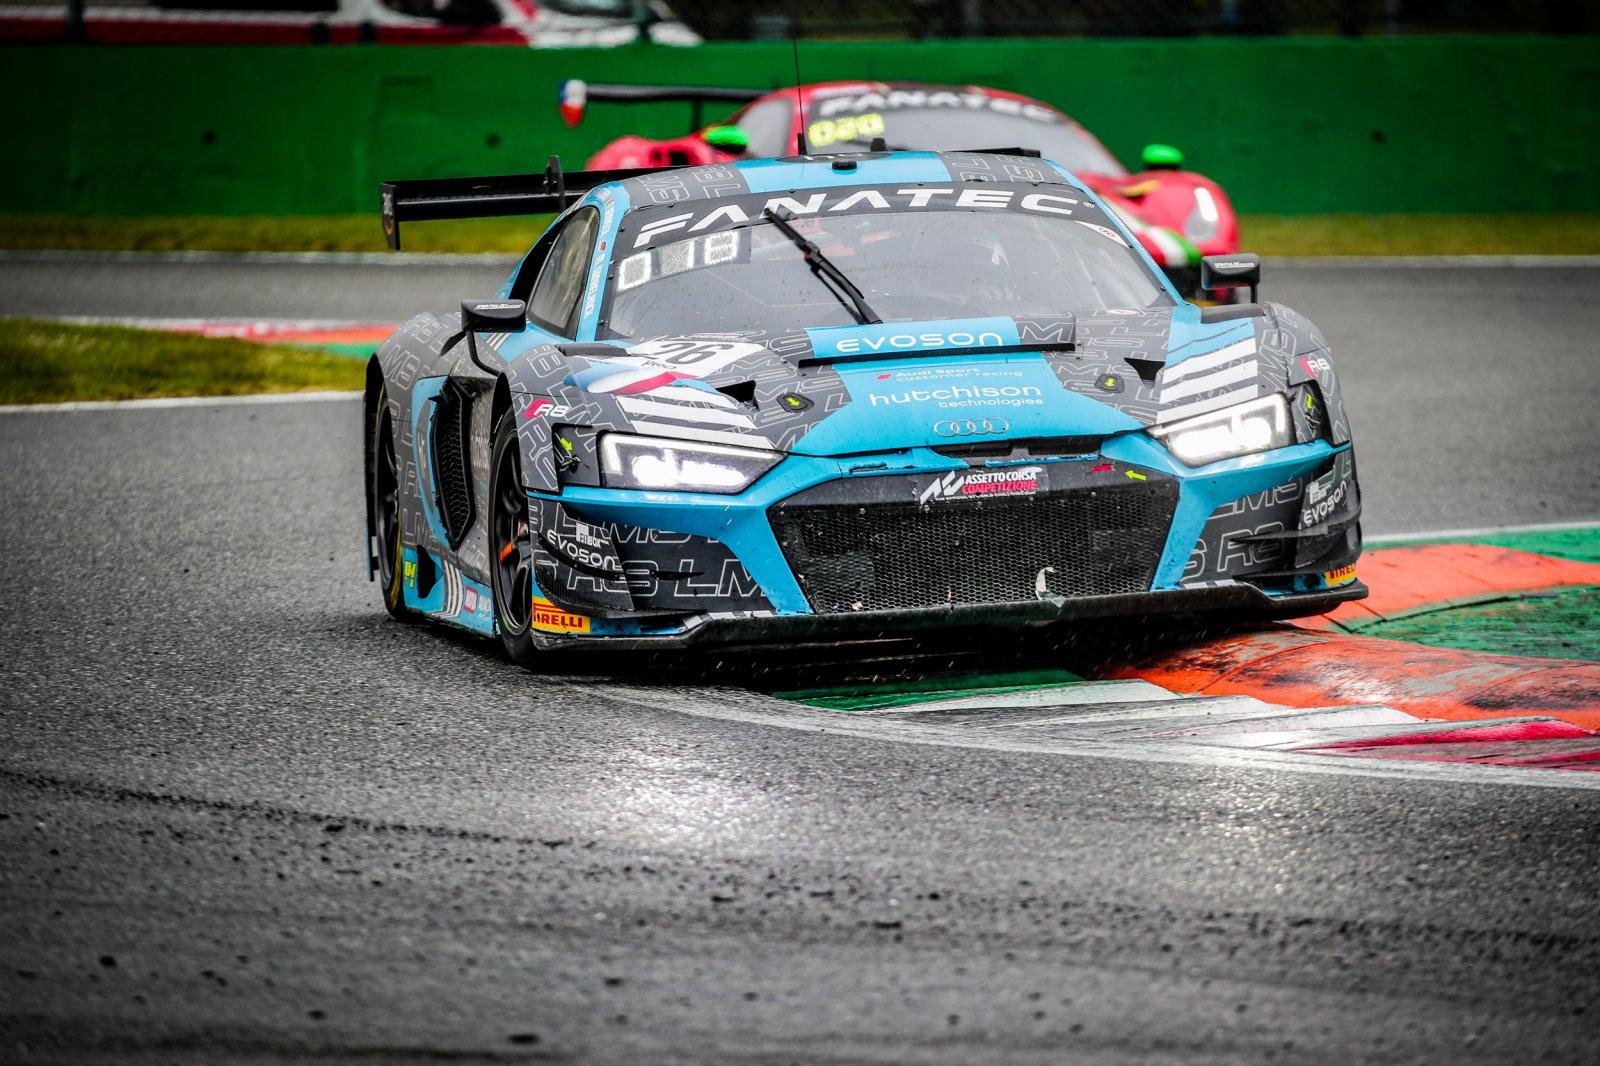 Sprint Cup grid grows to 30 cars as Saintéloc Racing adds third Audi for Misano